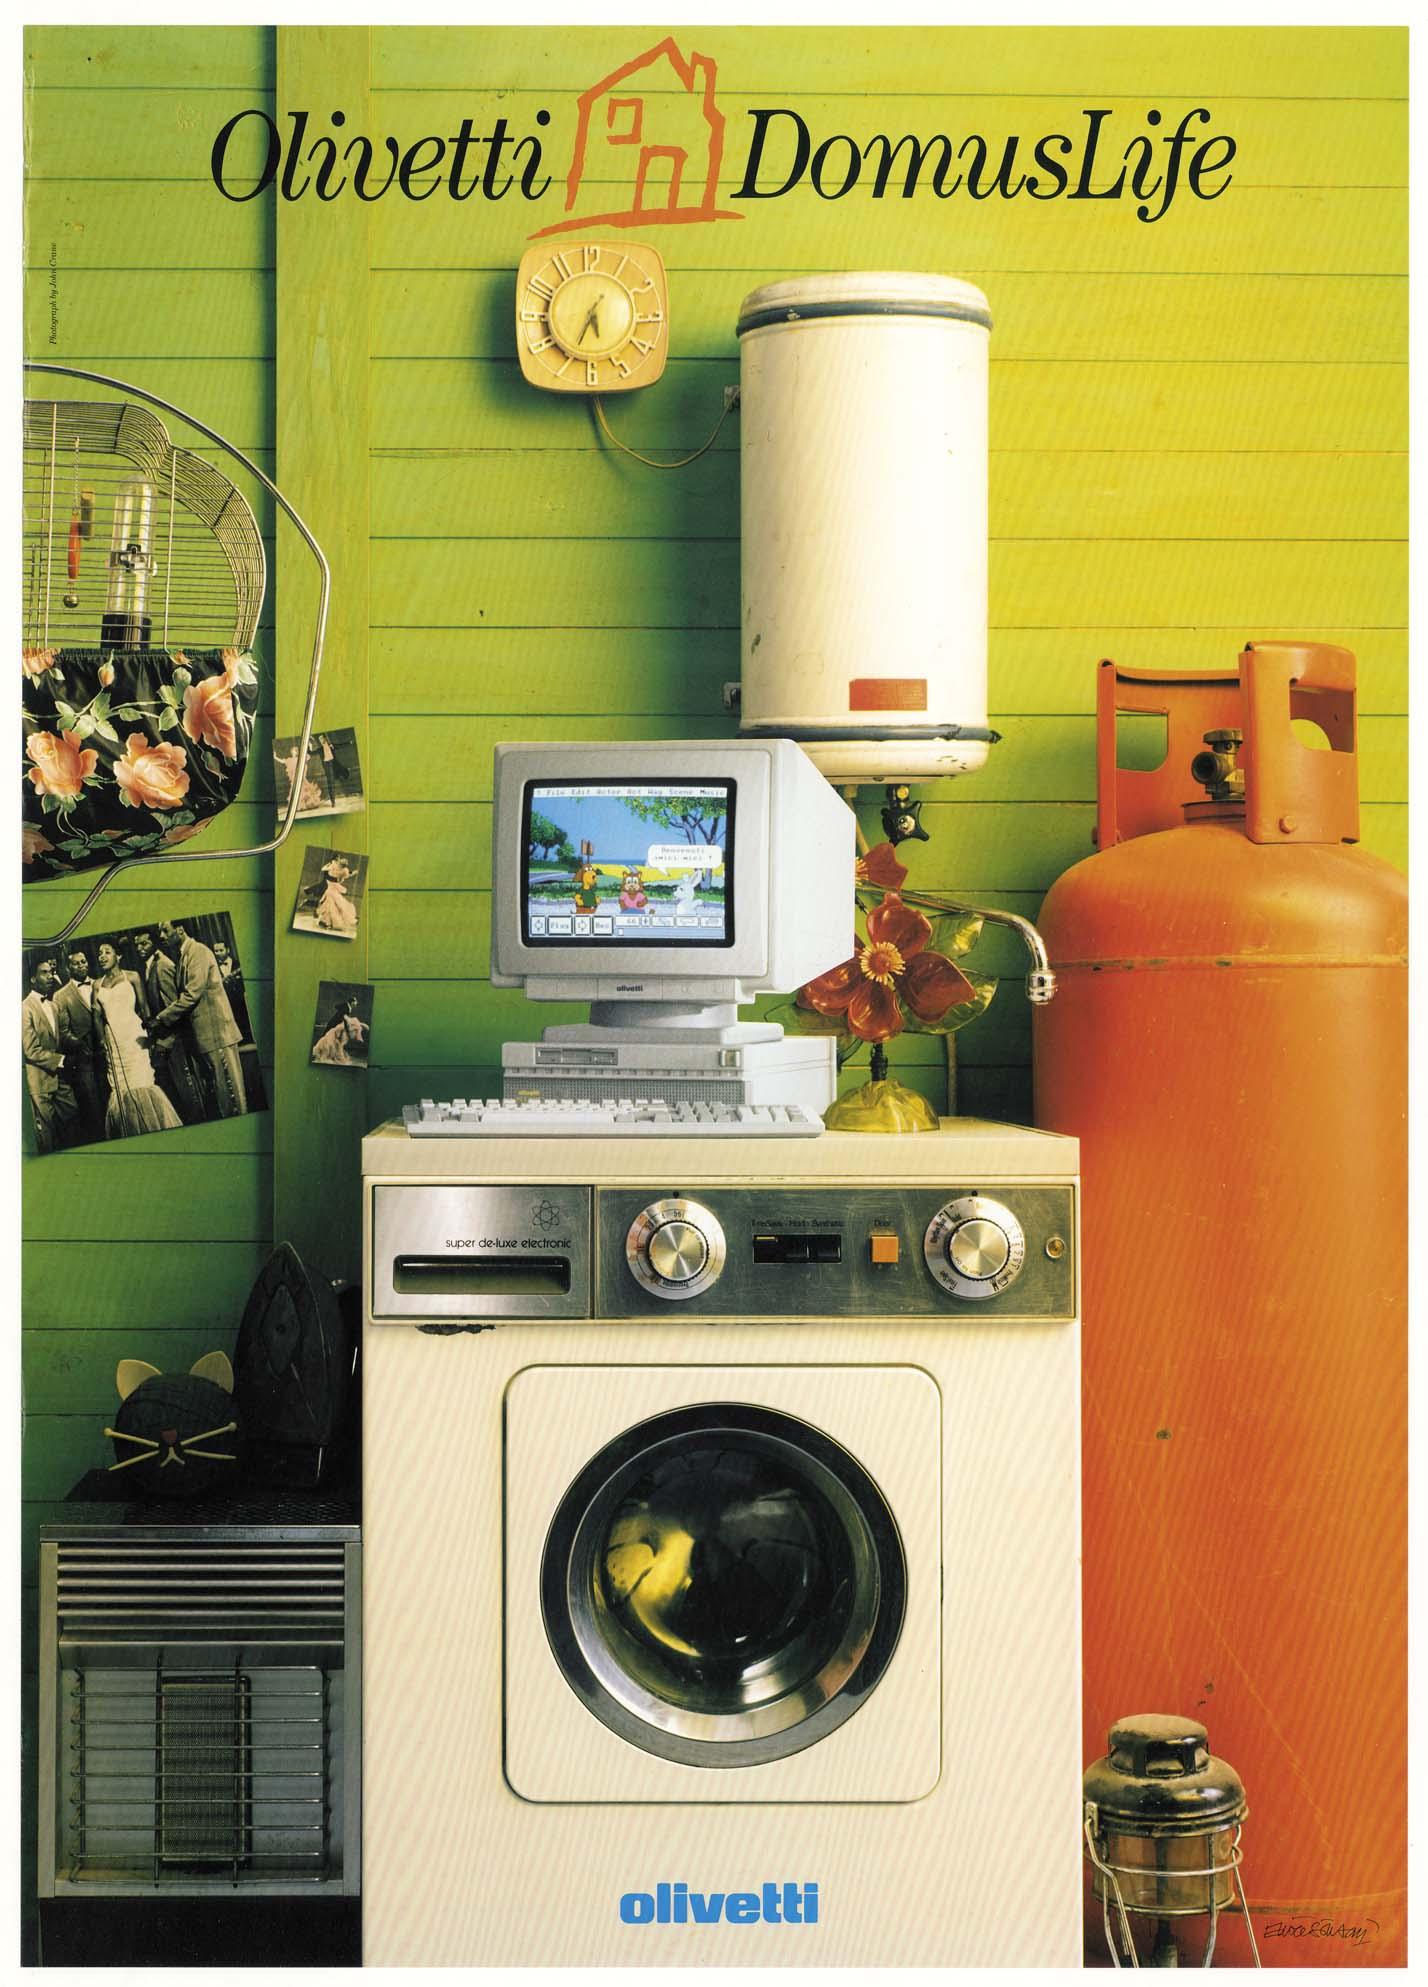 Olivetti Domuslife (lavatrice)